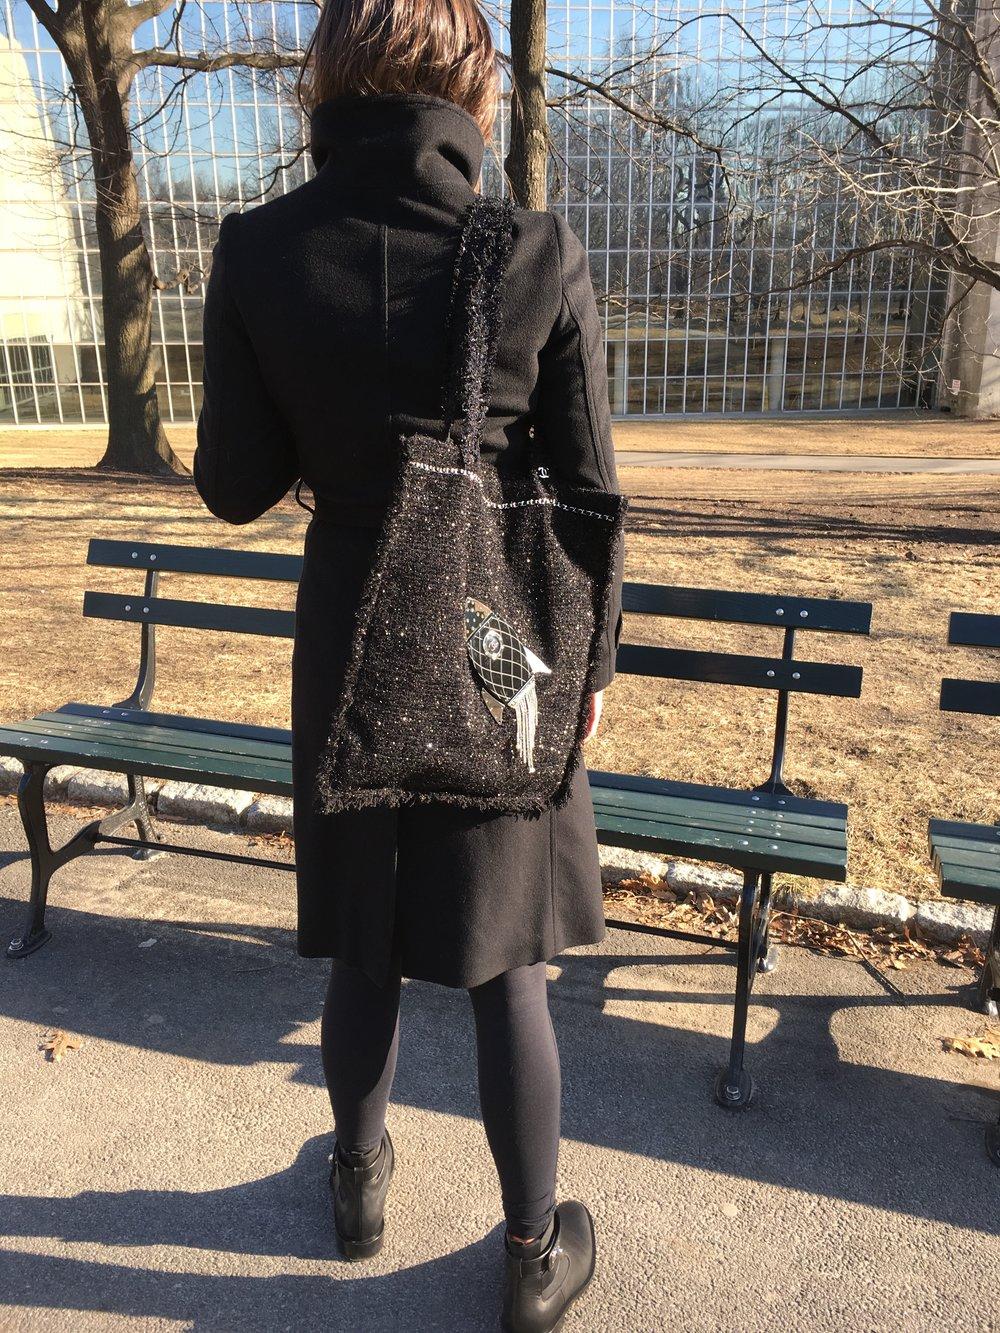 Chanel Rocket Ship Tote Bag